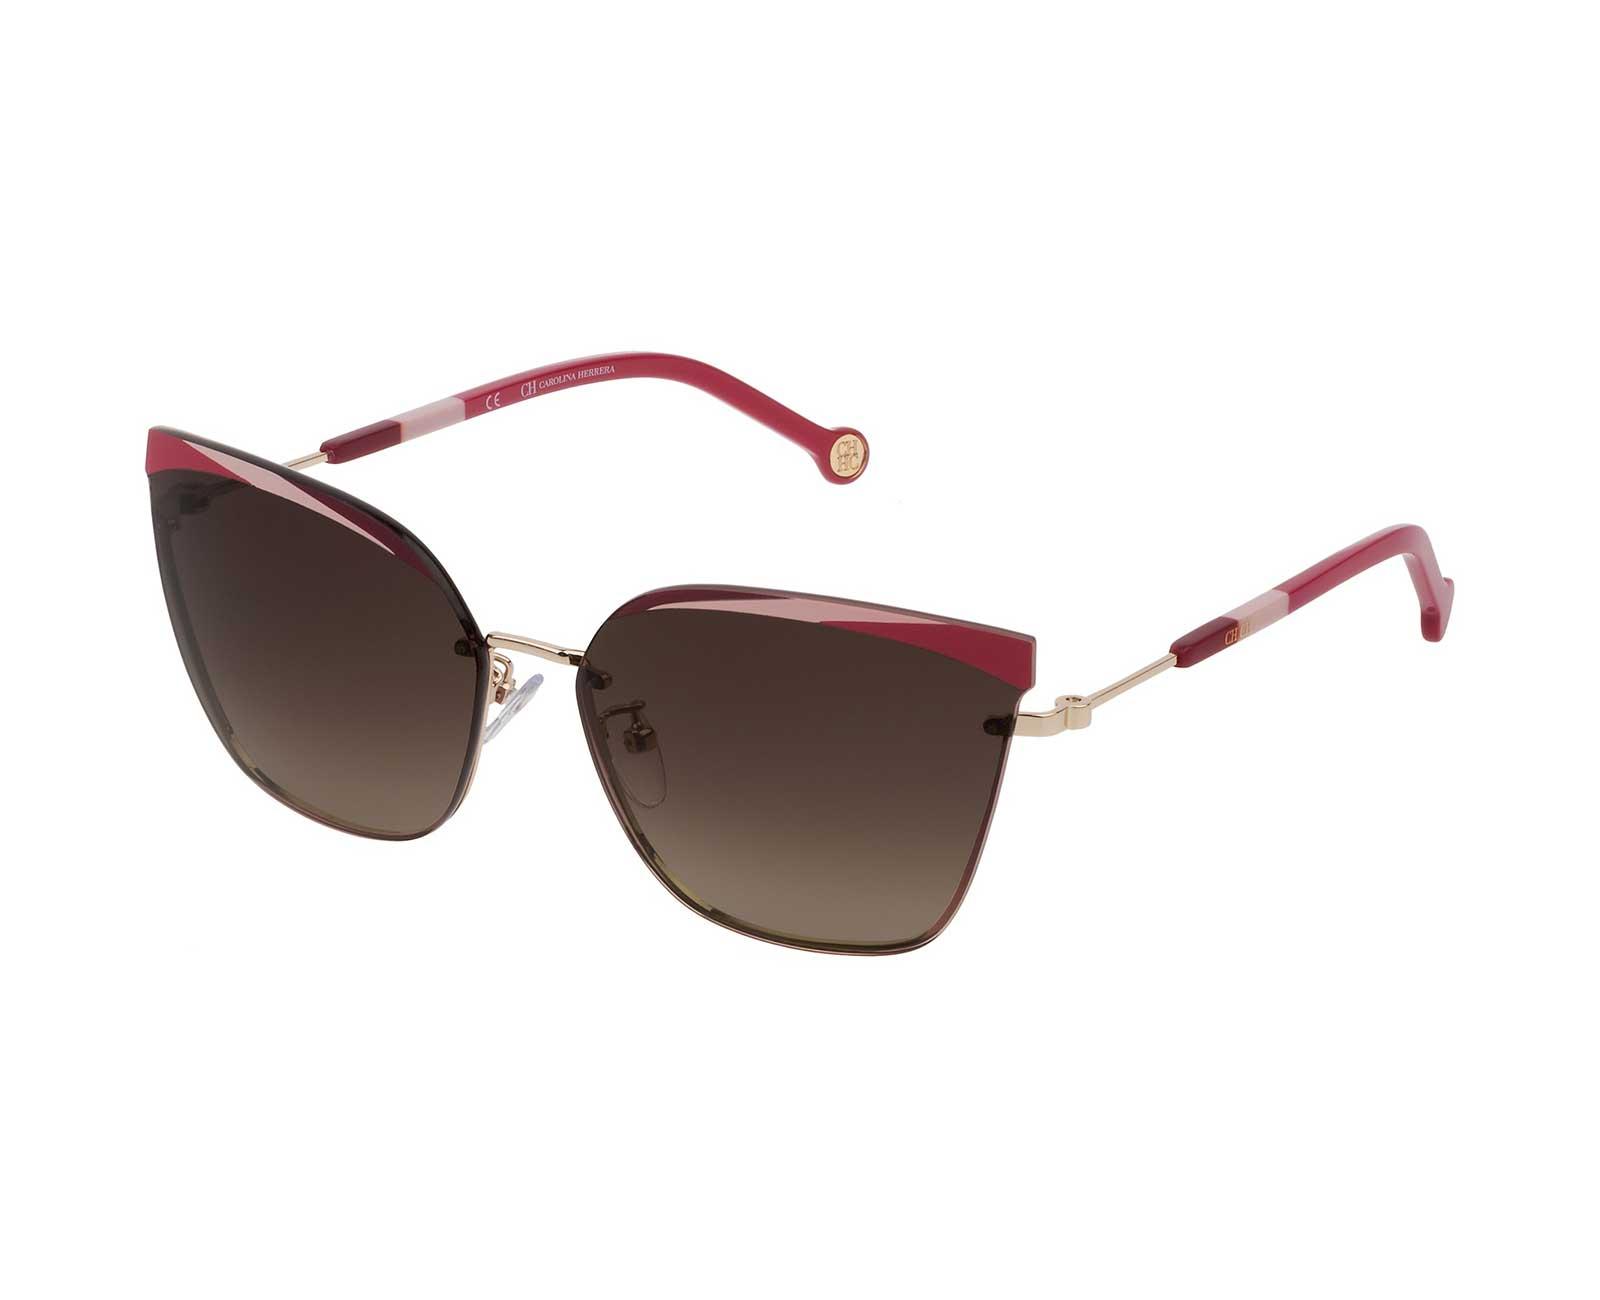 Carolina Herrera SHE147 in Brown Gradient Pink